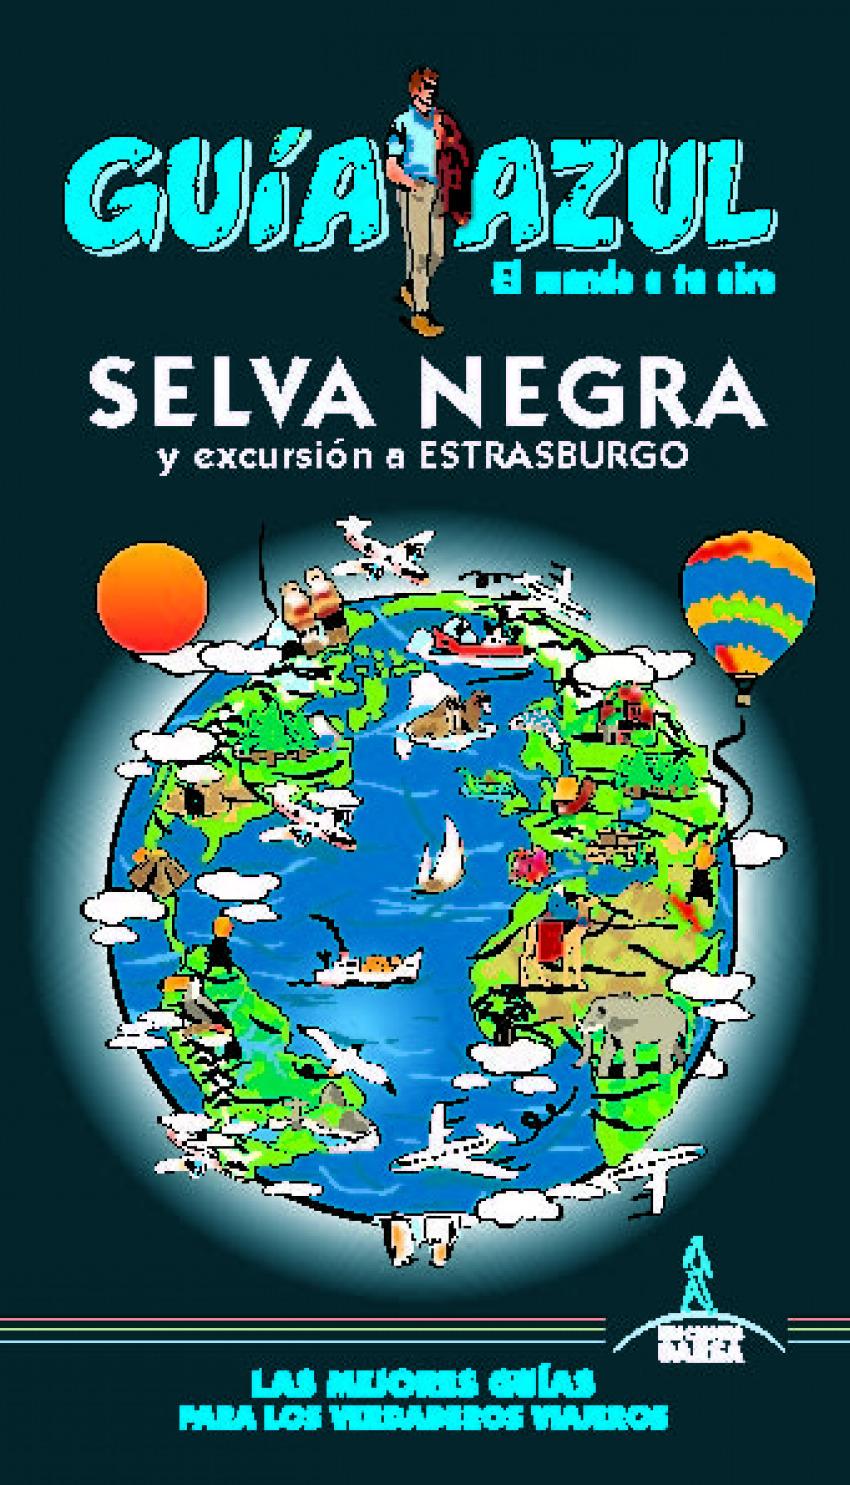 SELVA NEGRA 2019